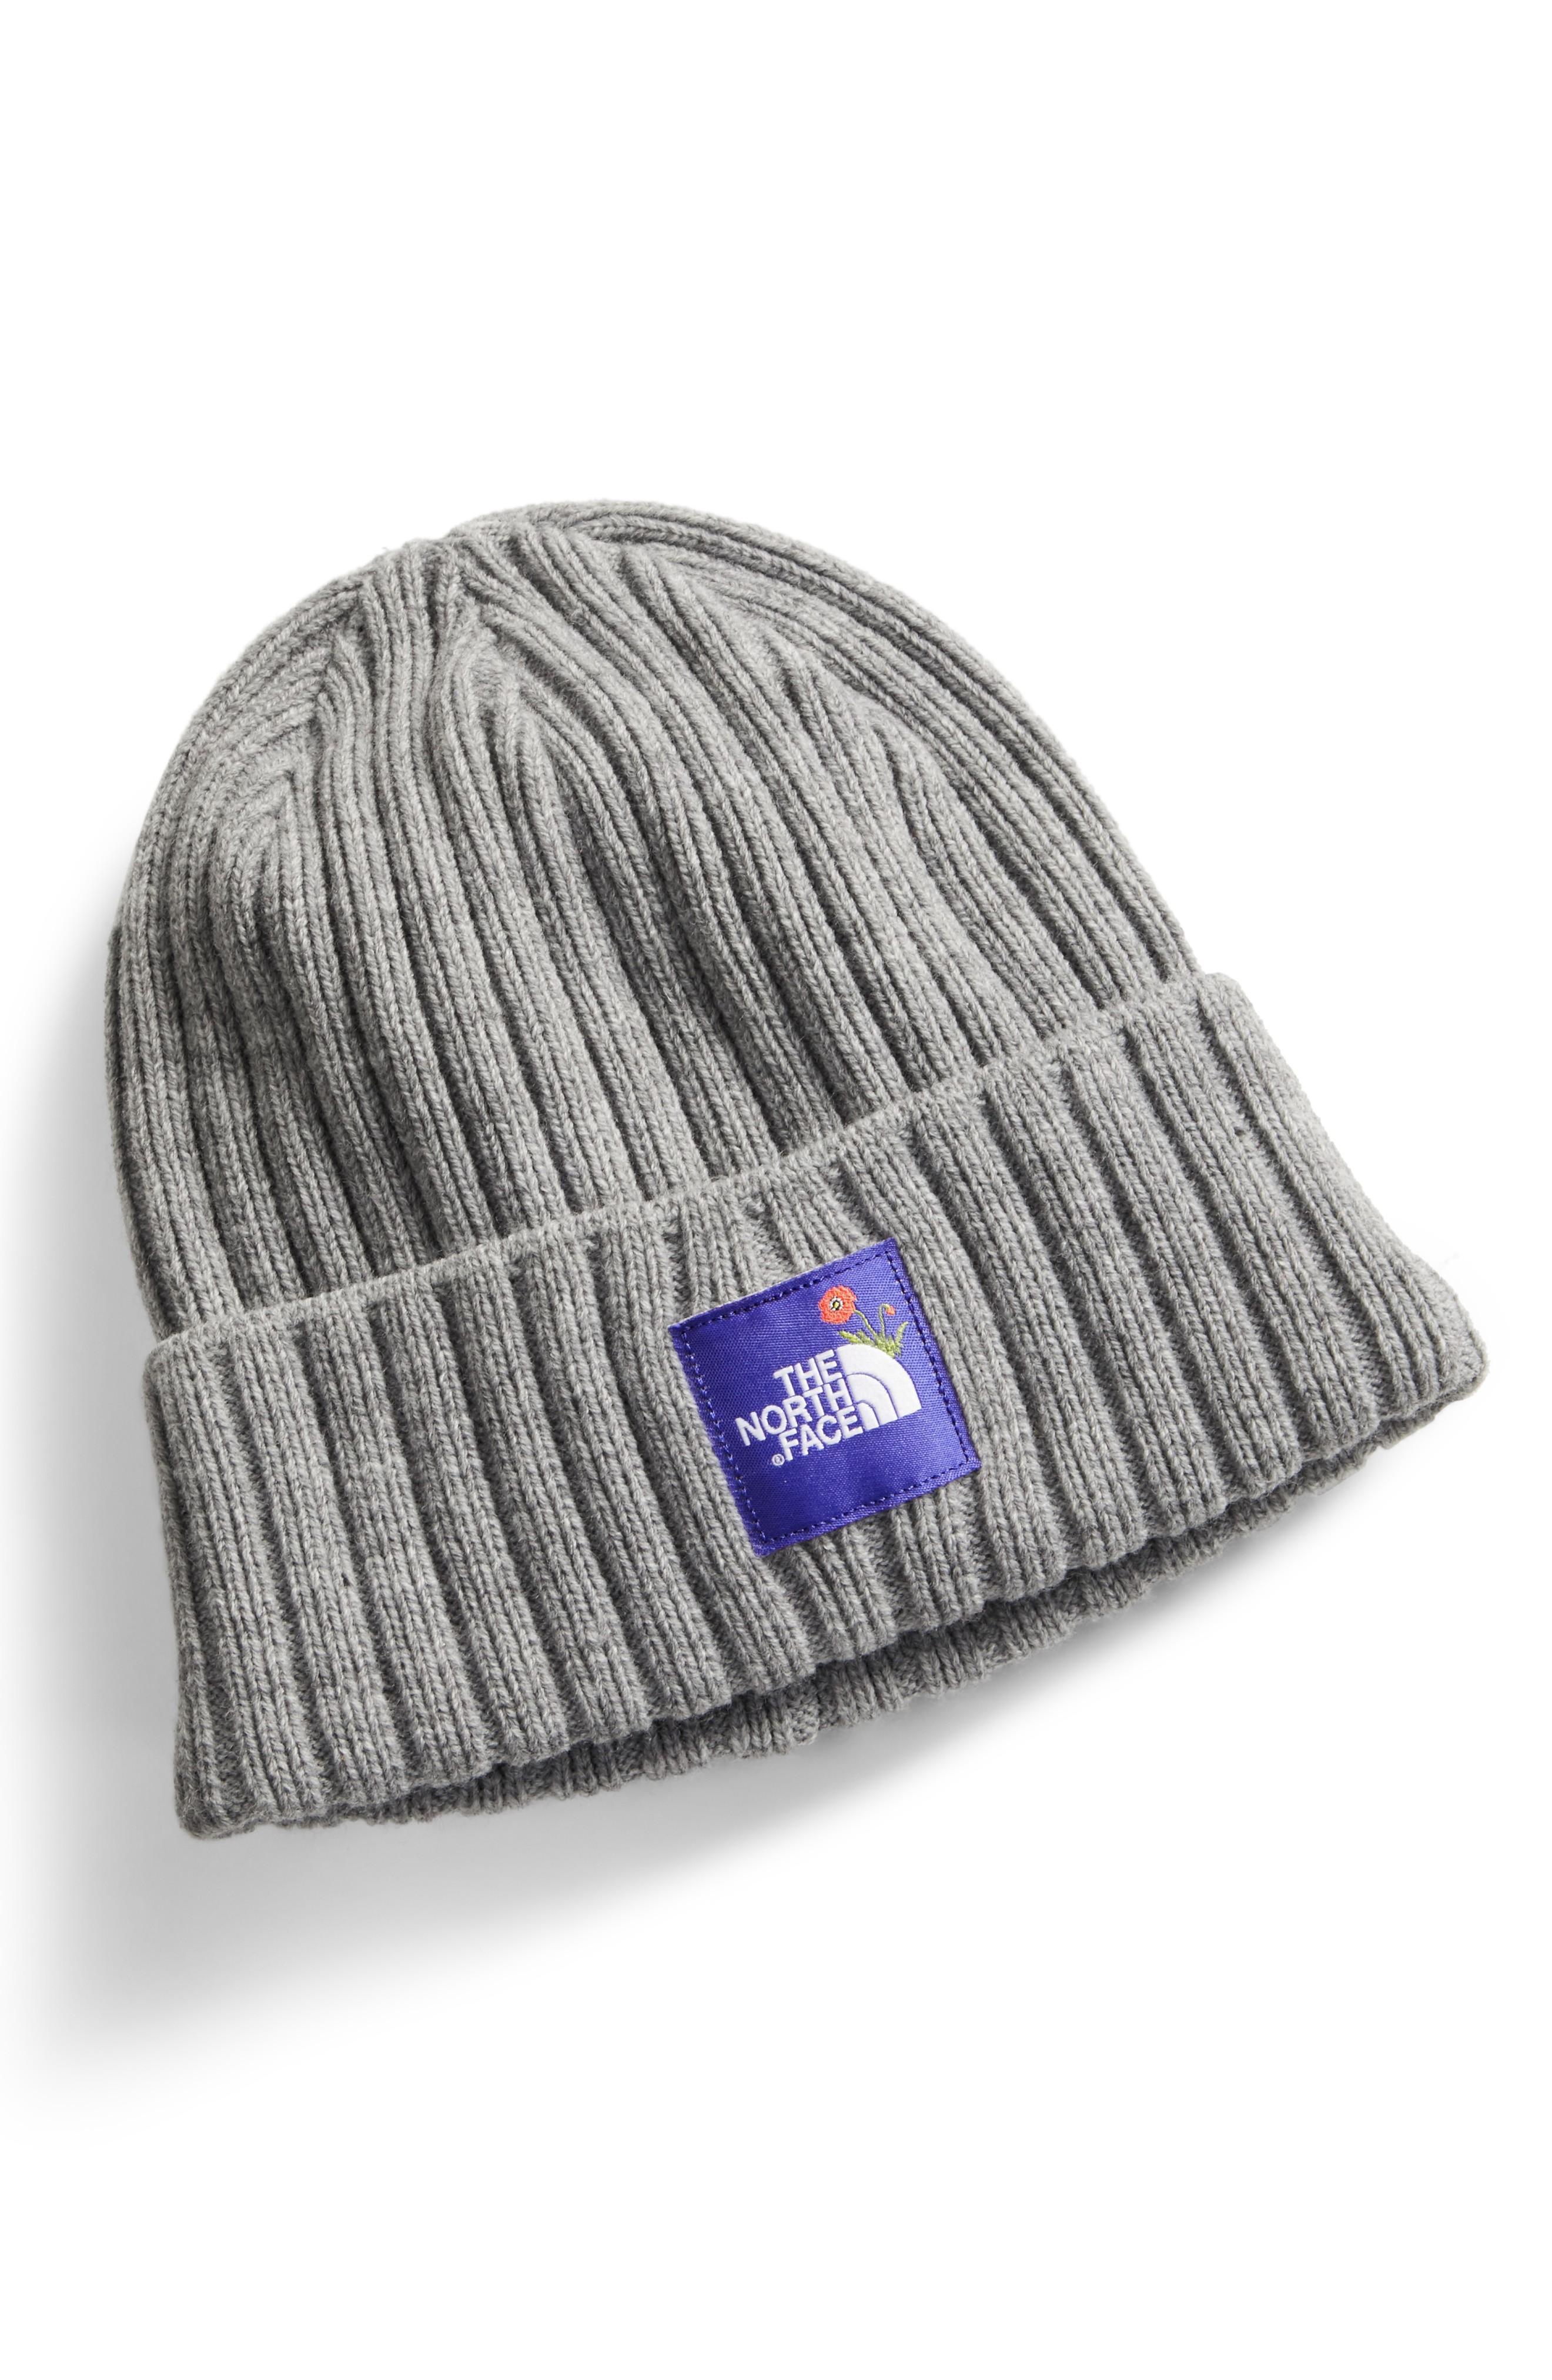 98943e470dd The North Face Logo Boxed Cuffed Beanie - Grey In Light Grey Htr ...